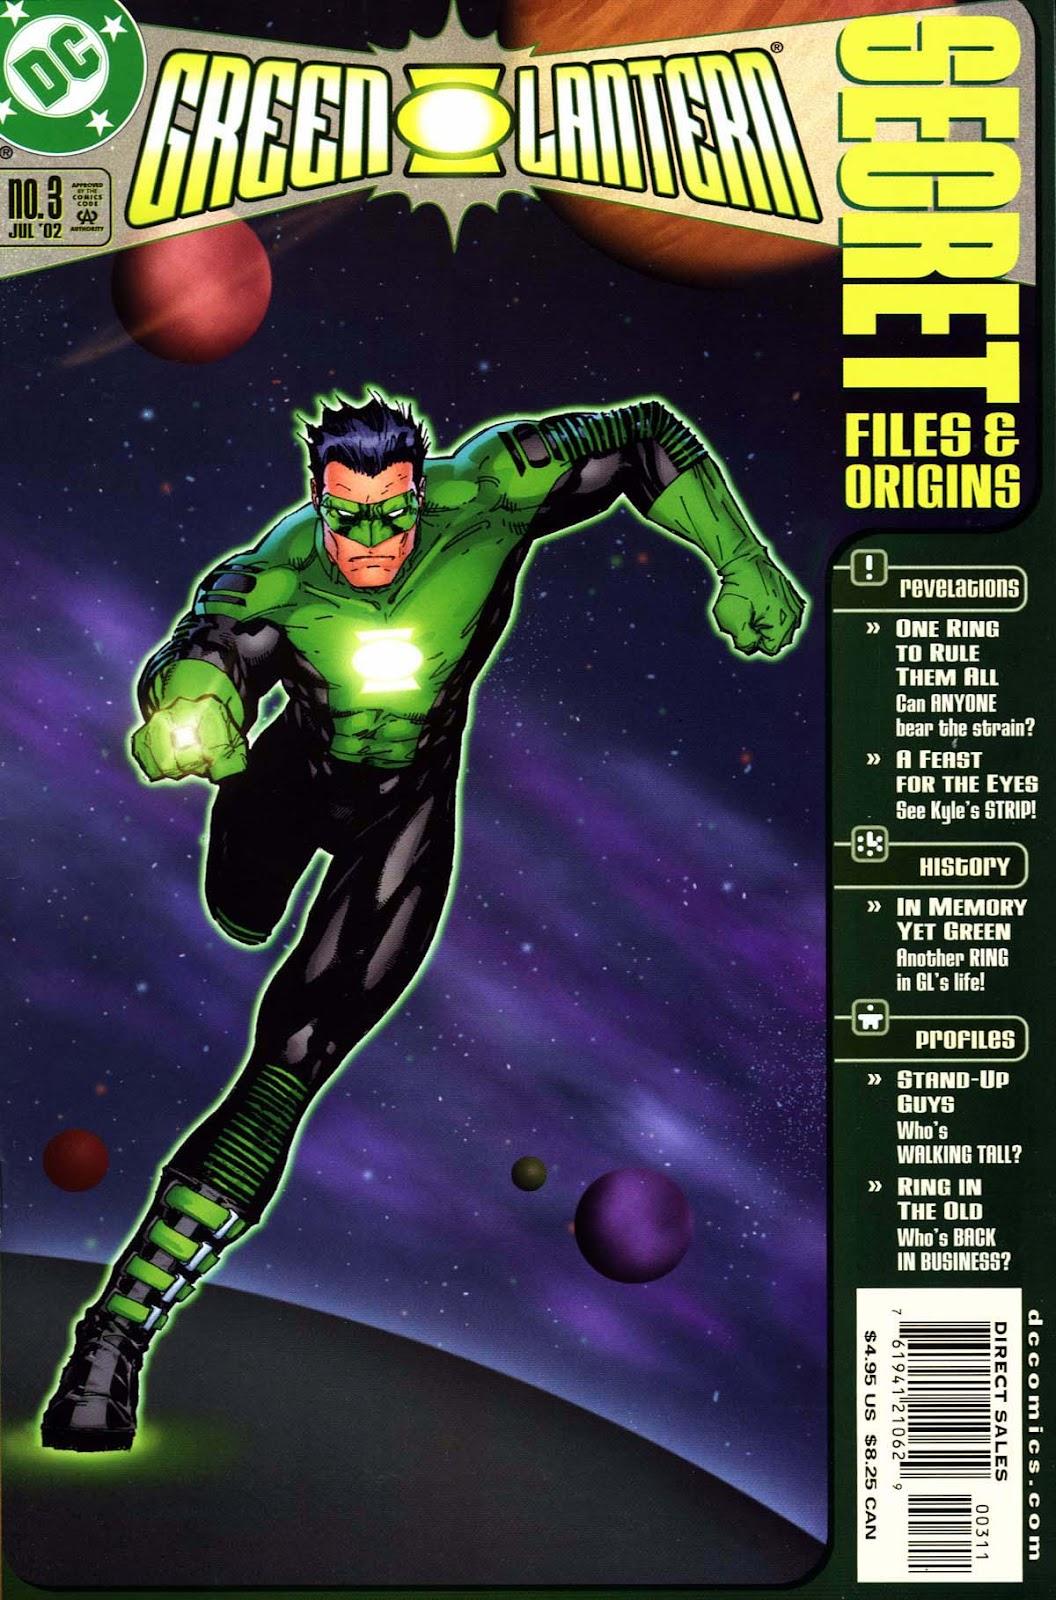 Green Lantern Secret Files and Origins (2002) Full Page 1